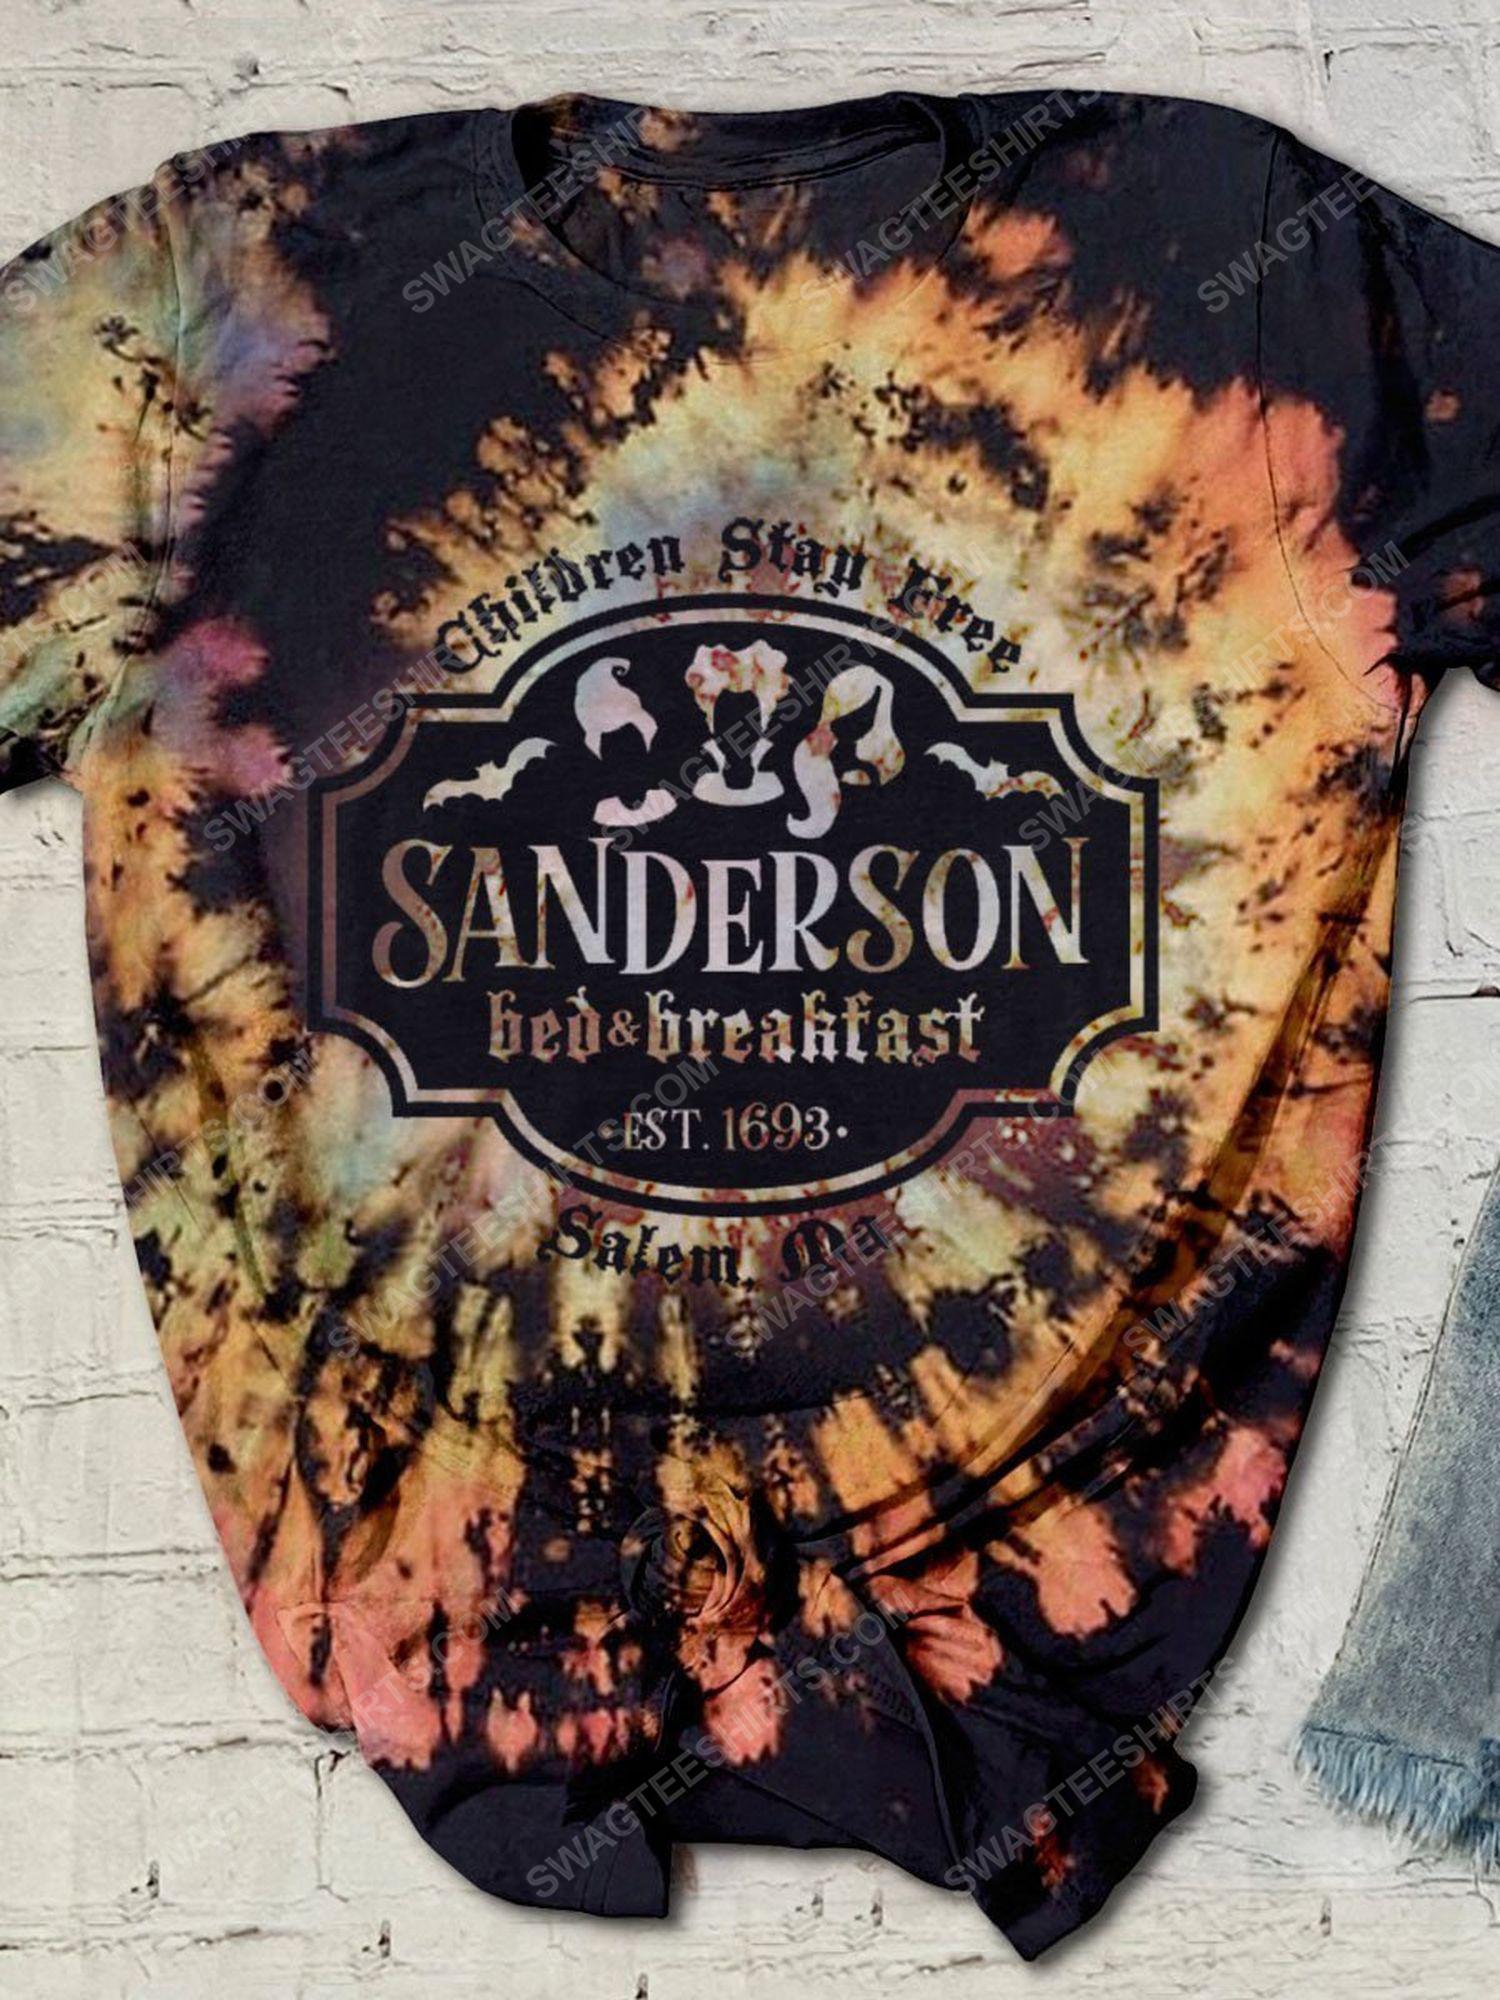 Halloween sanderson sisters children stay free shirt 1 - Copy